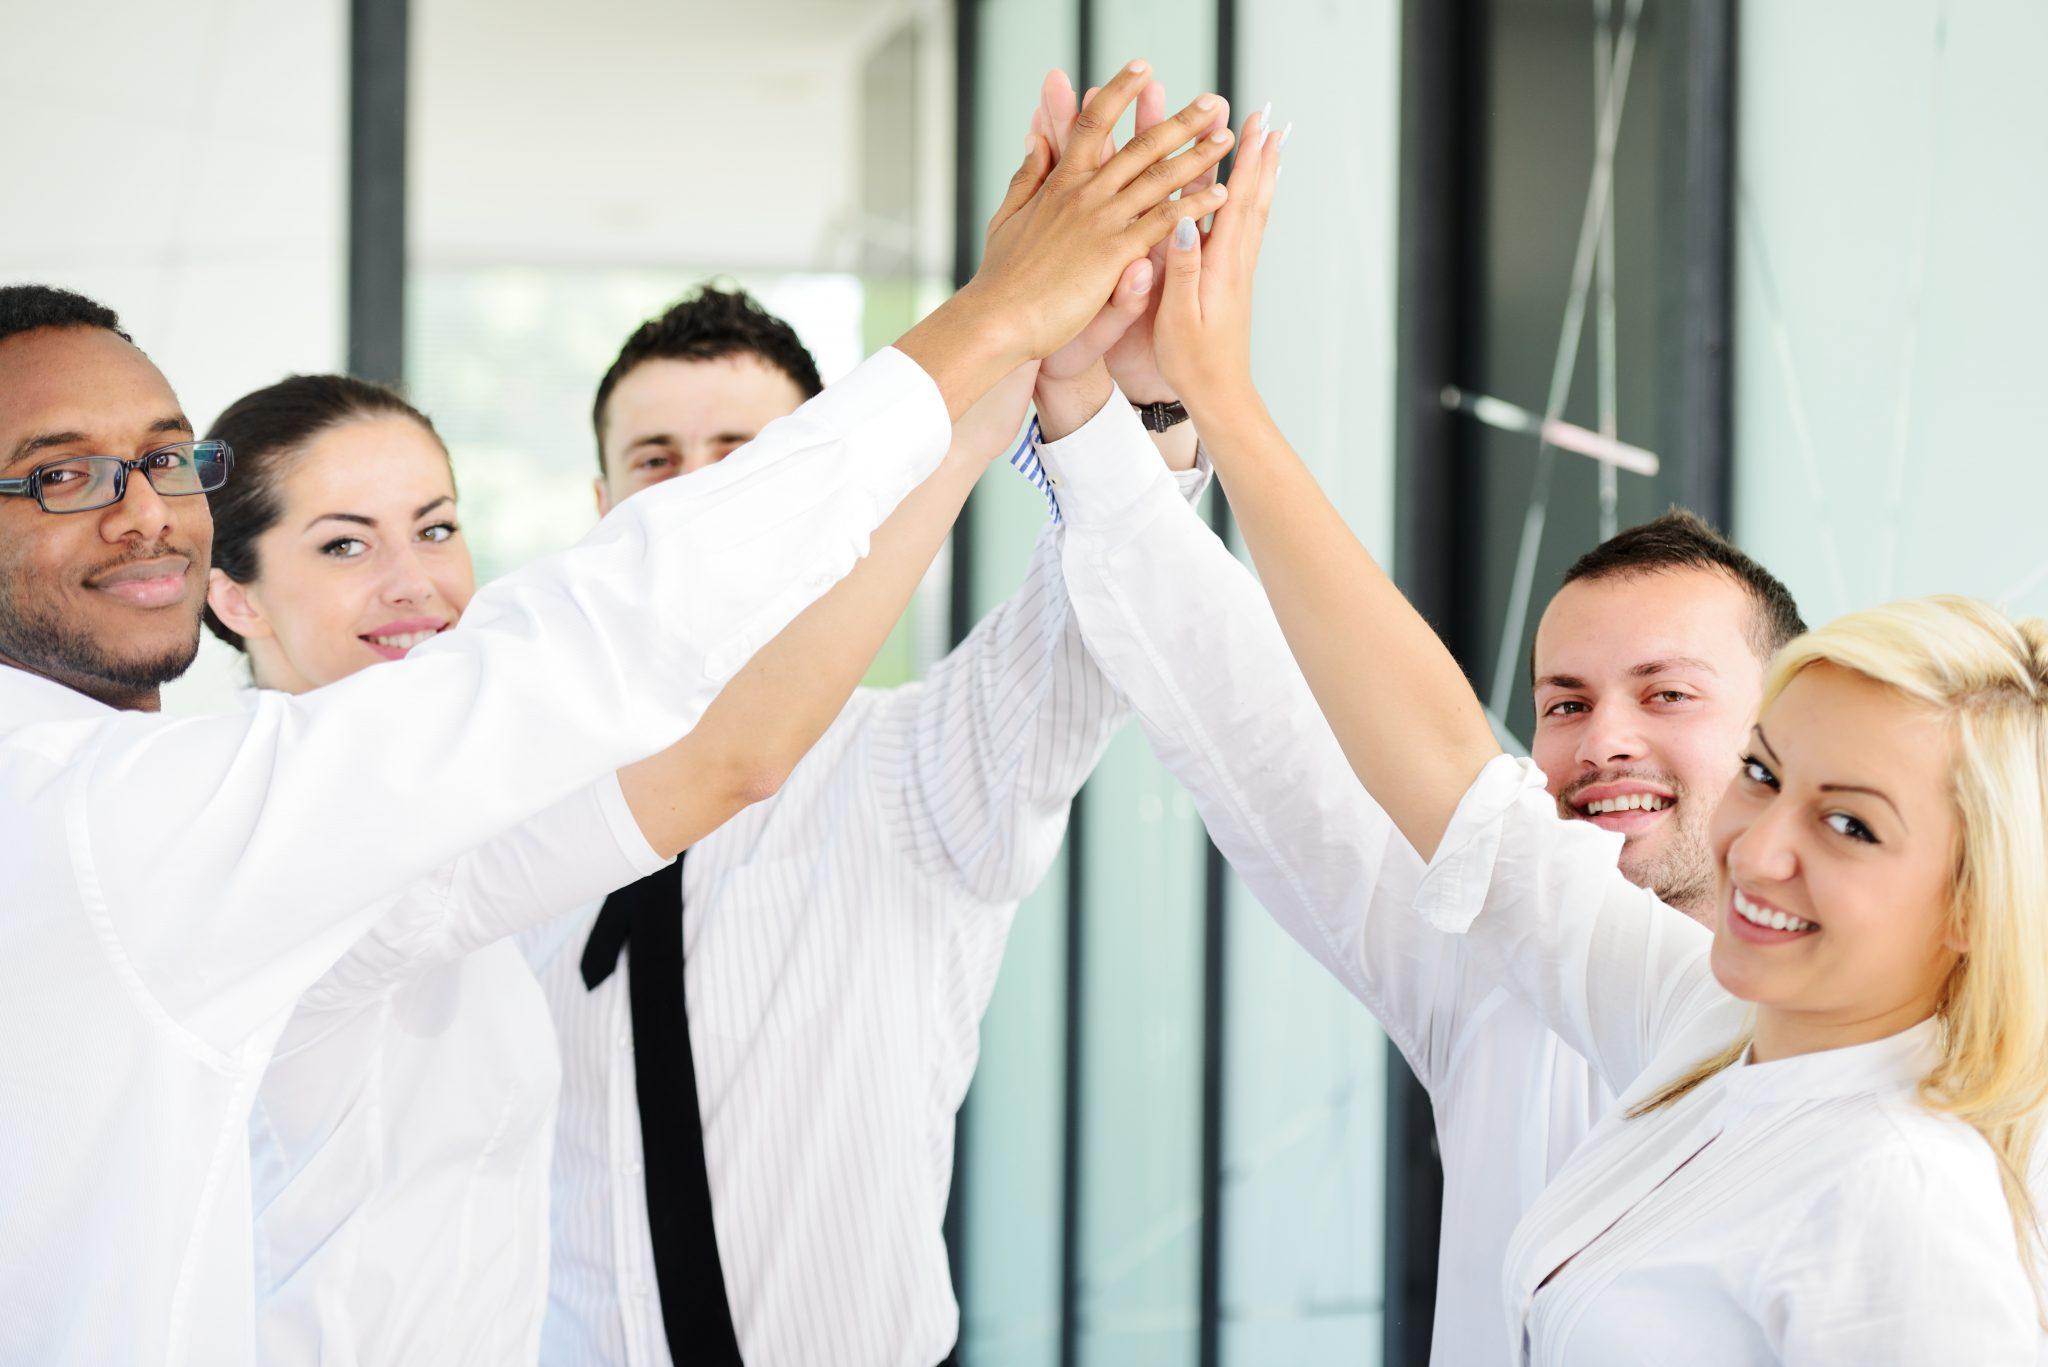 successful-business-people_BKh6NwR4o.jpg